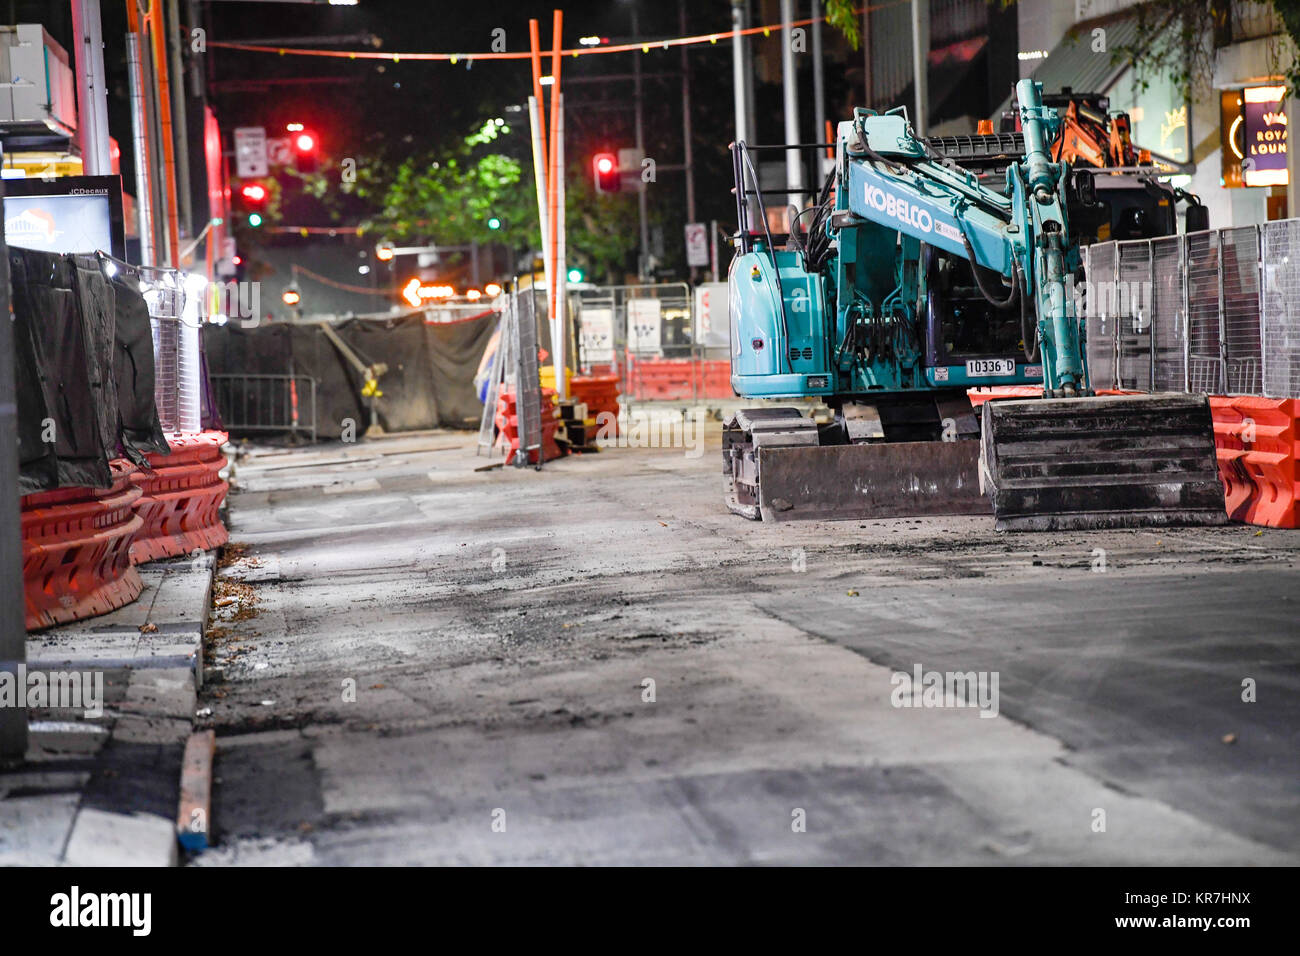 Sydney, Australia - 17th December 2017: Construction site seen setup